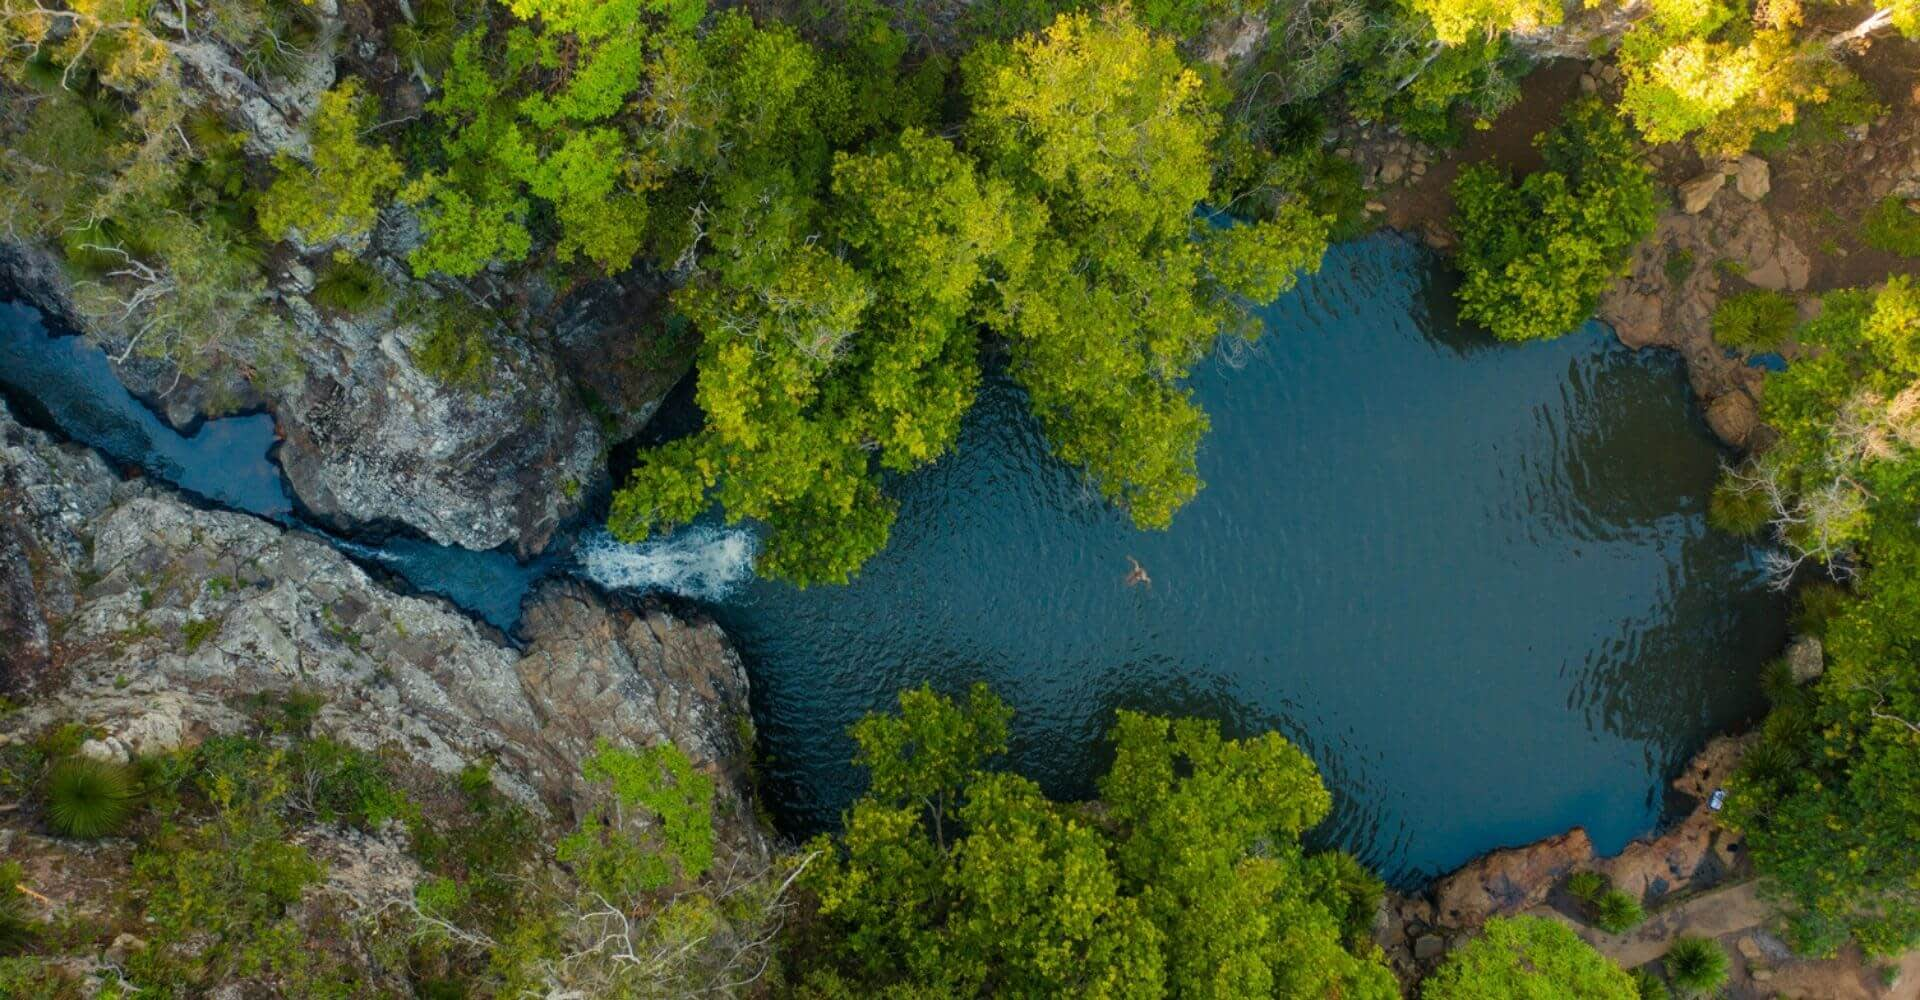 Above image: Kondalilla Falls